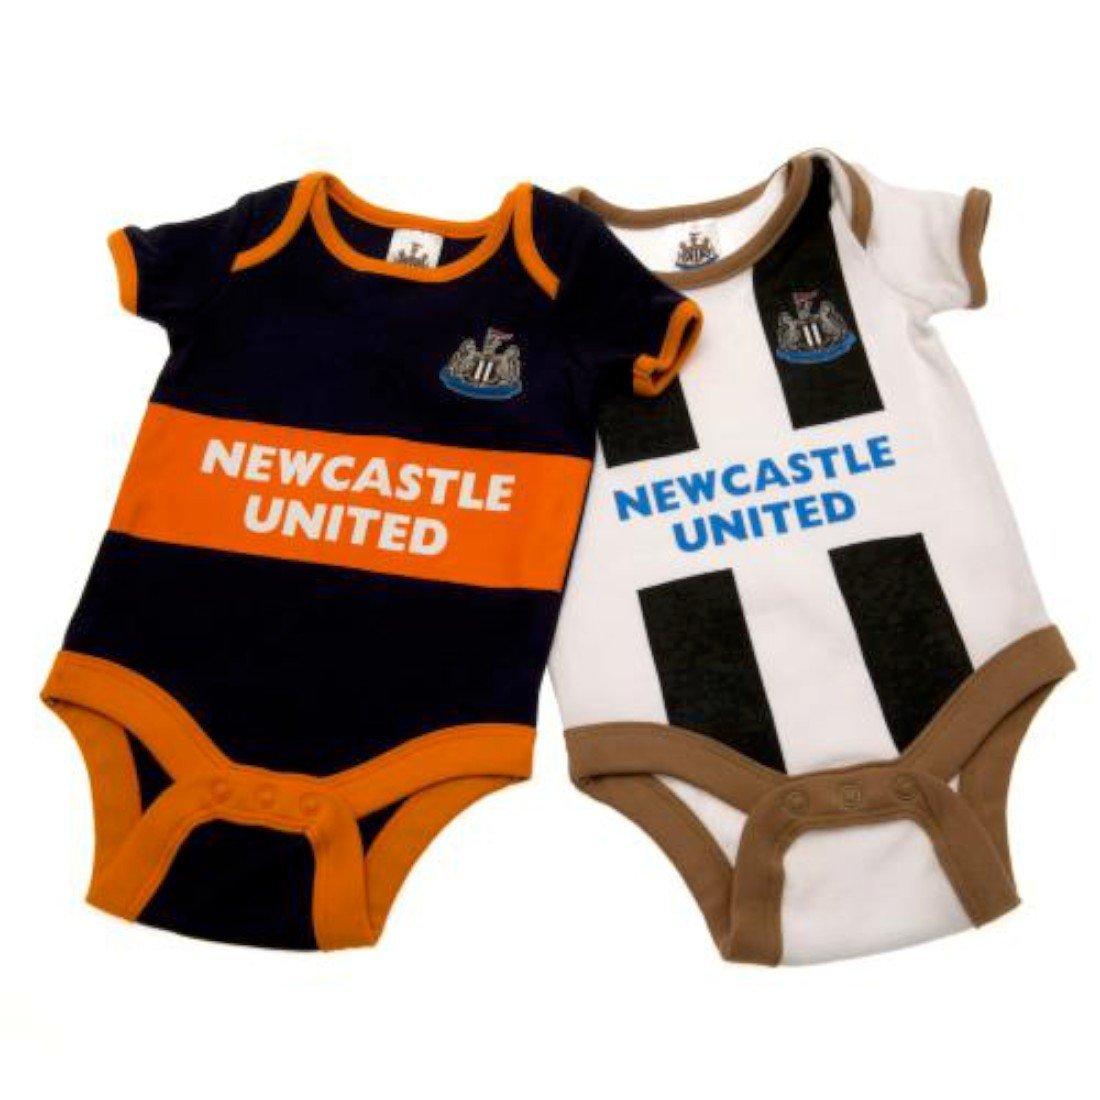 Newcastle United FC Baby Bodysuits 2 Pack 2016//17 Season 9-12 months